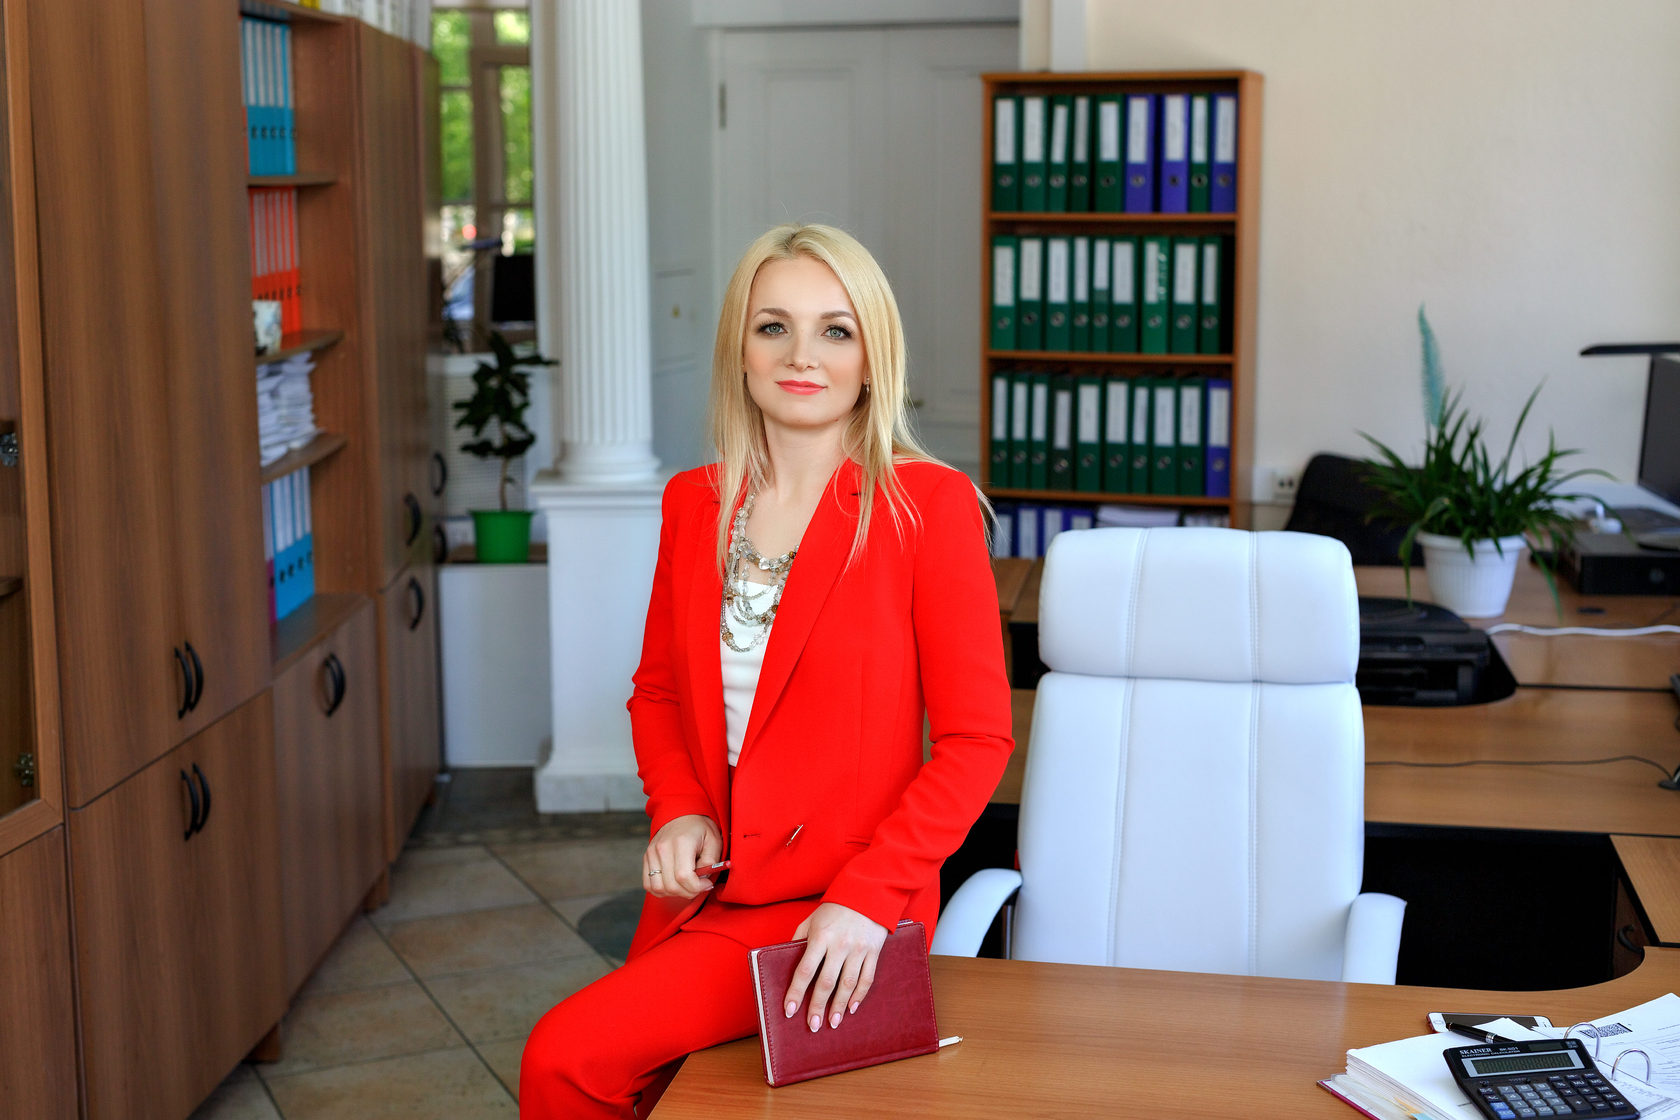 Бухгалтер пушкино как найти клиента на бухгалтерские услуги